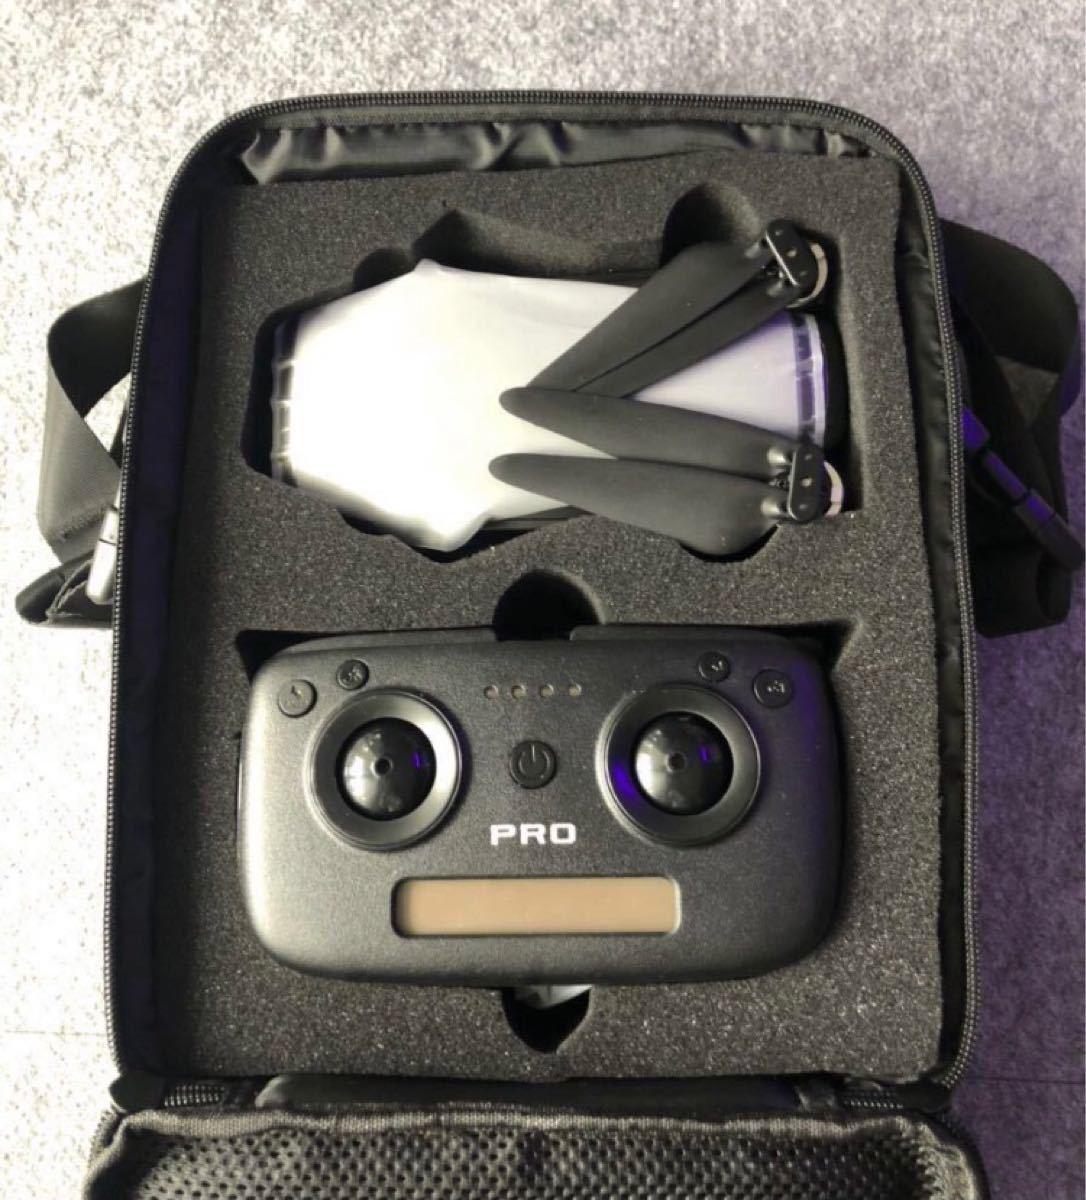 SG906 PRO 4Kカメラ、バッテリー×2 専用バッグ付